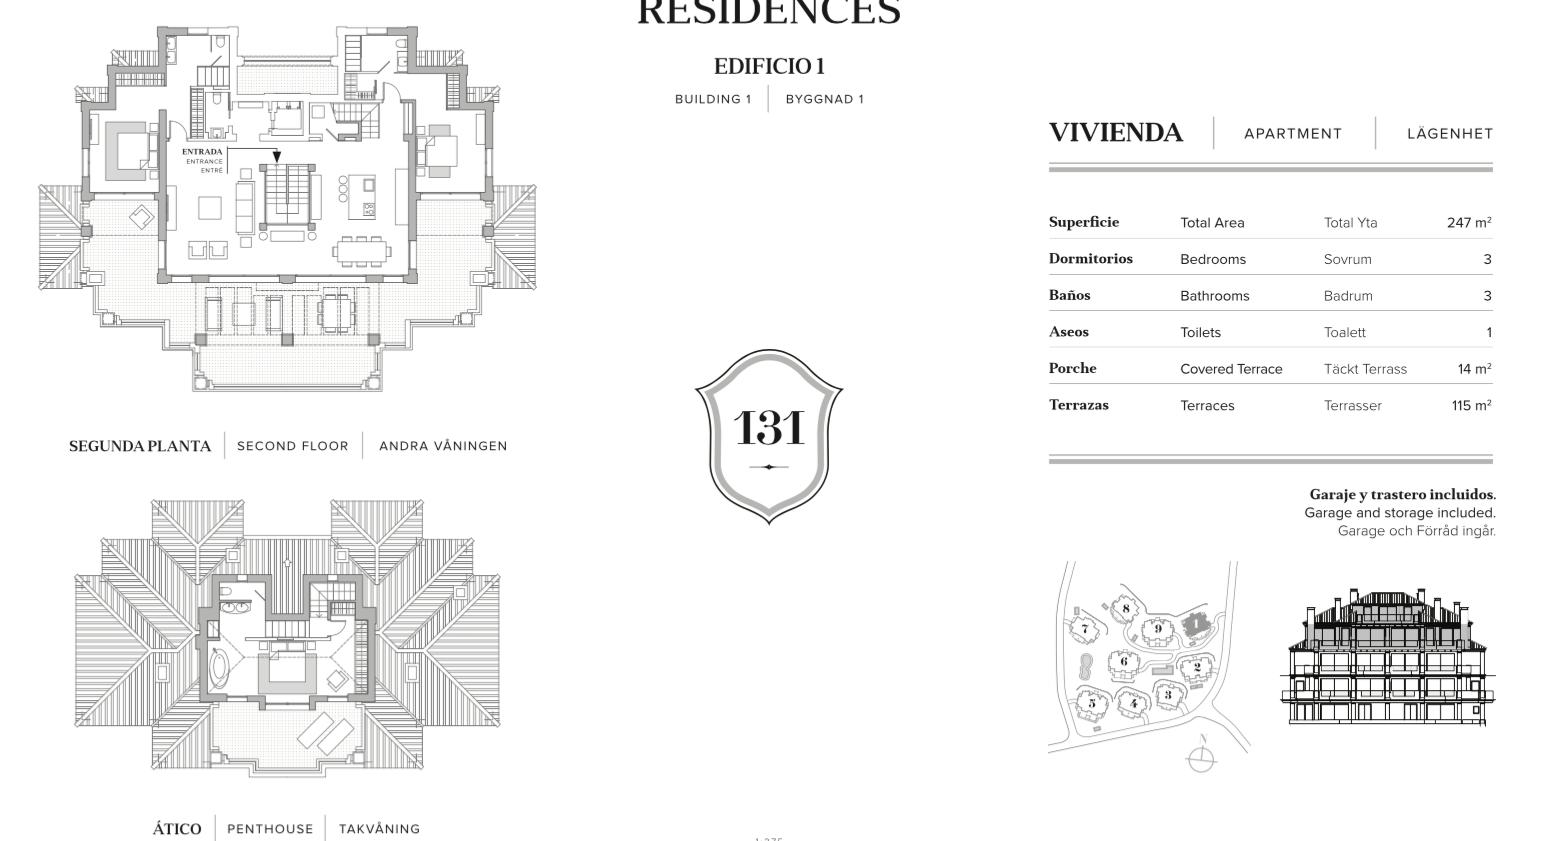 nine lions residences appartementen penthouses te koop nueva andalucia grondplan penthouse 3 slaapkamers